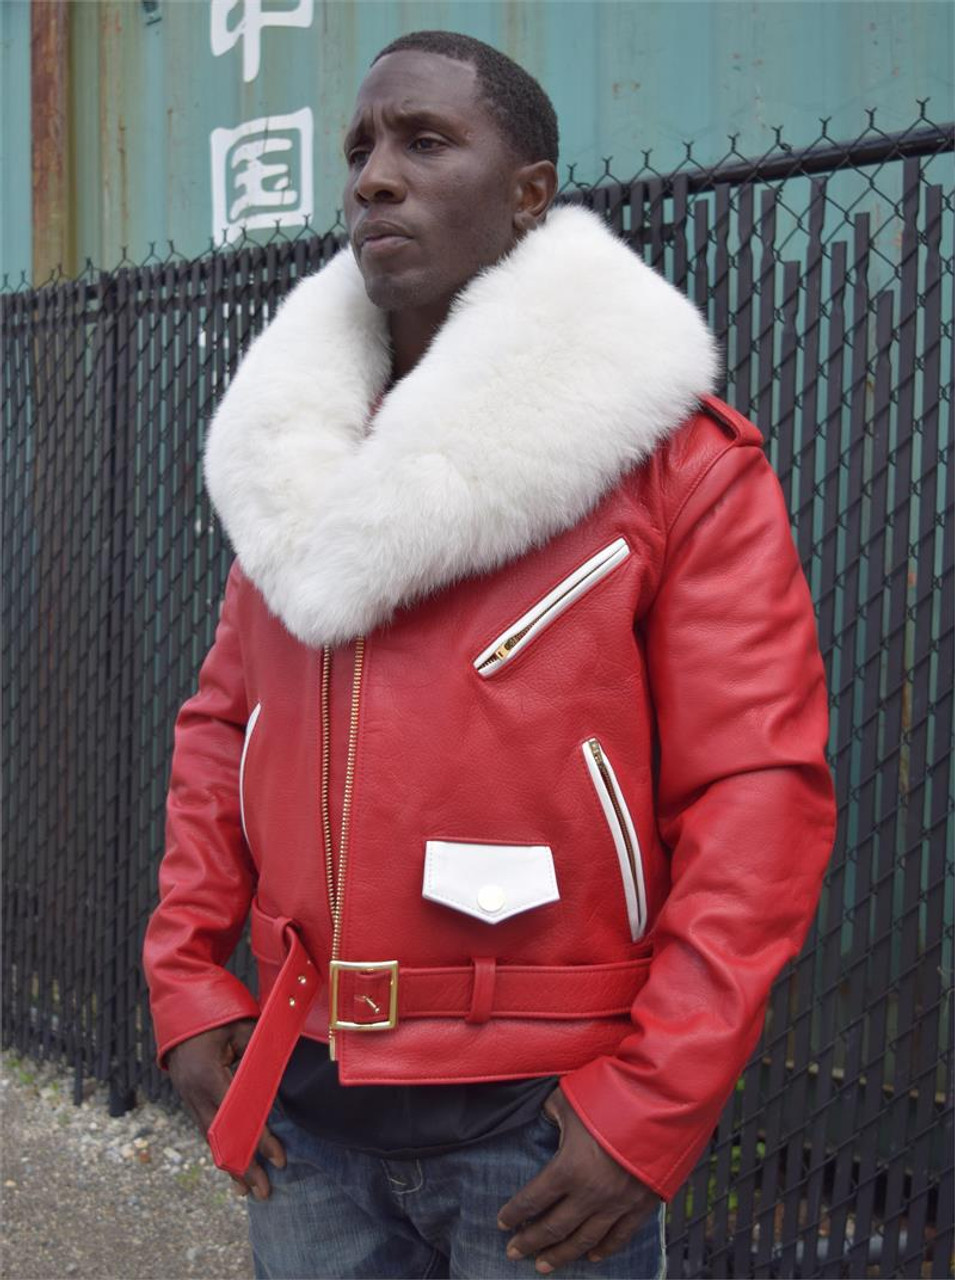 81fb46d0f285c G Gator Red   White Fox Fur Collar Leather Motorcycle Jacket - Hip Hop  Closet